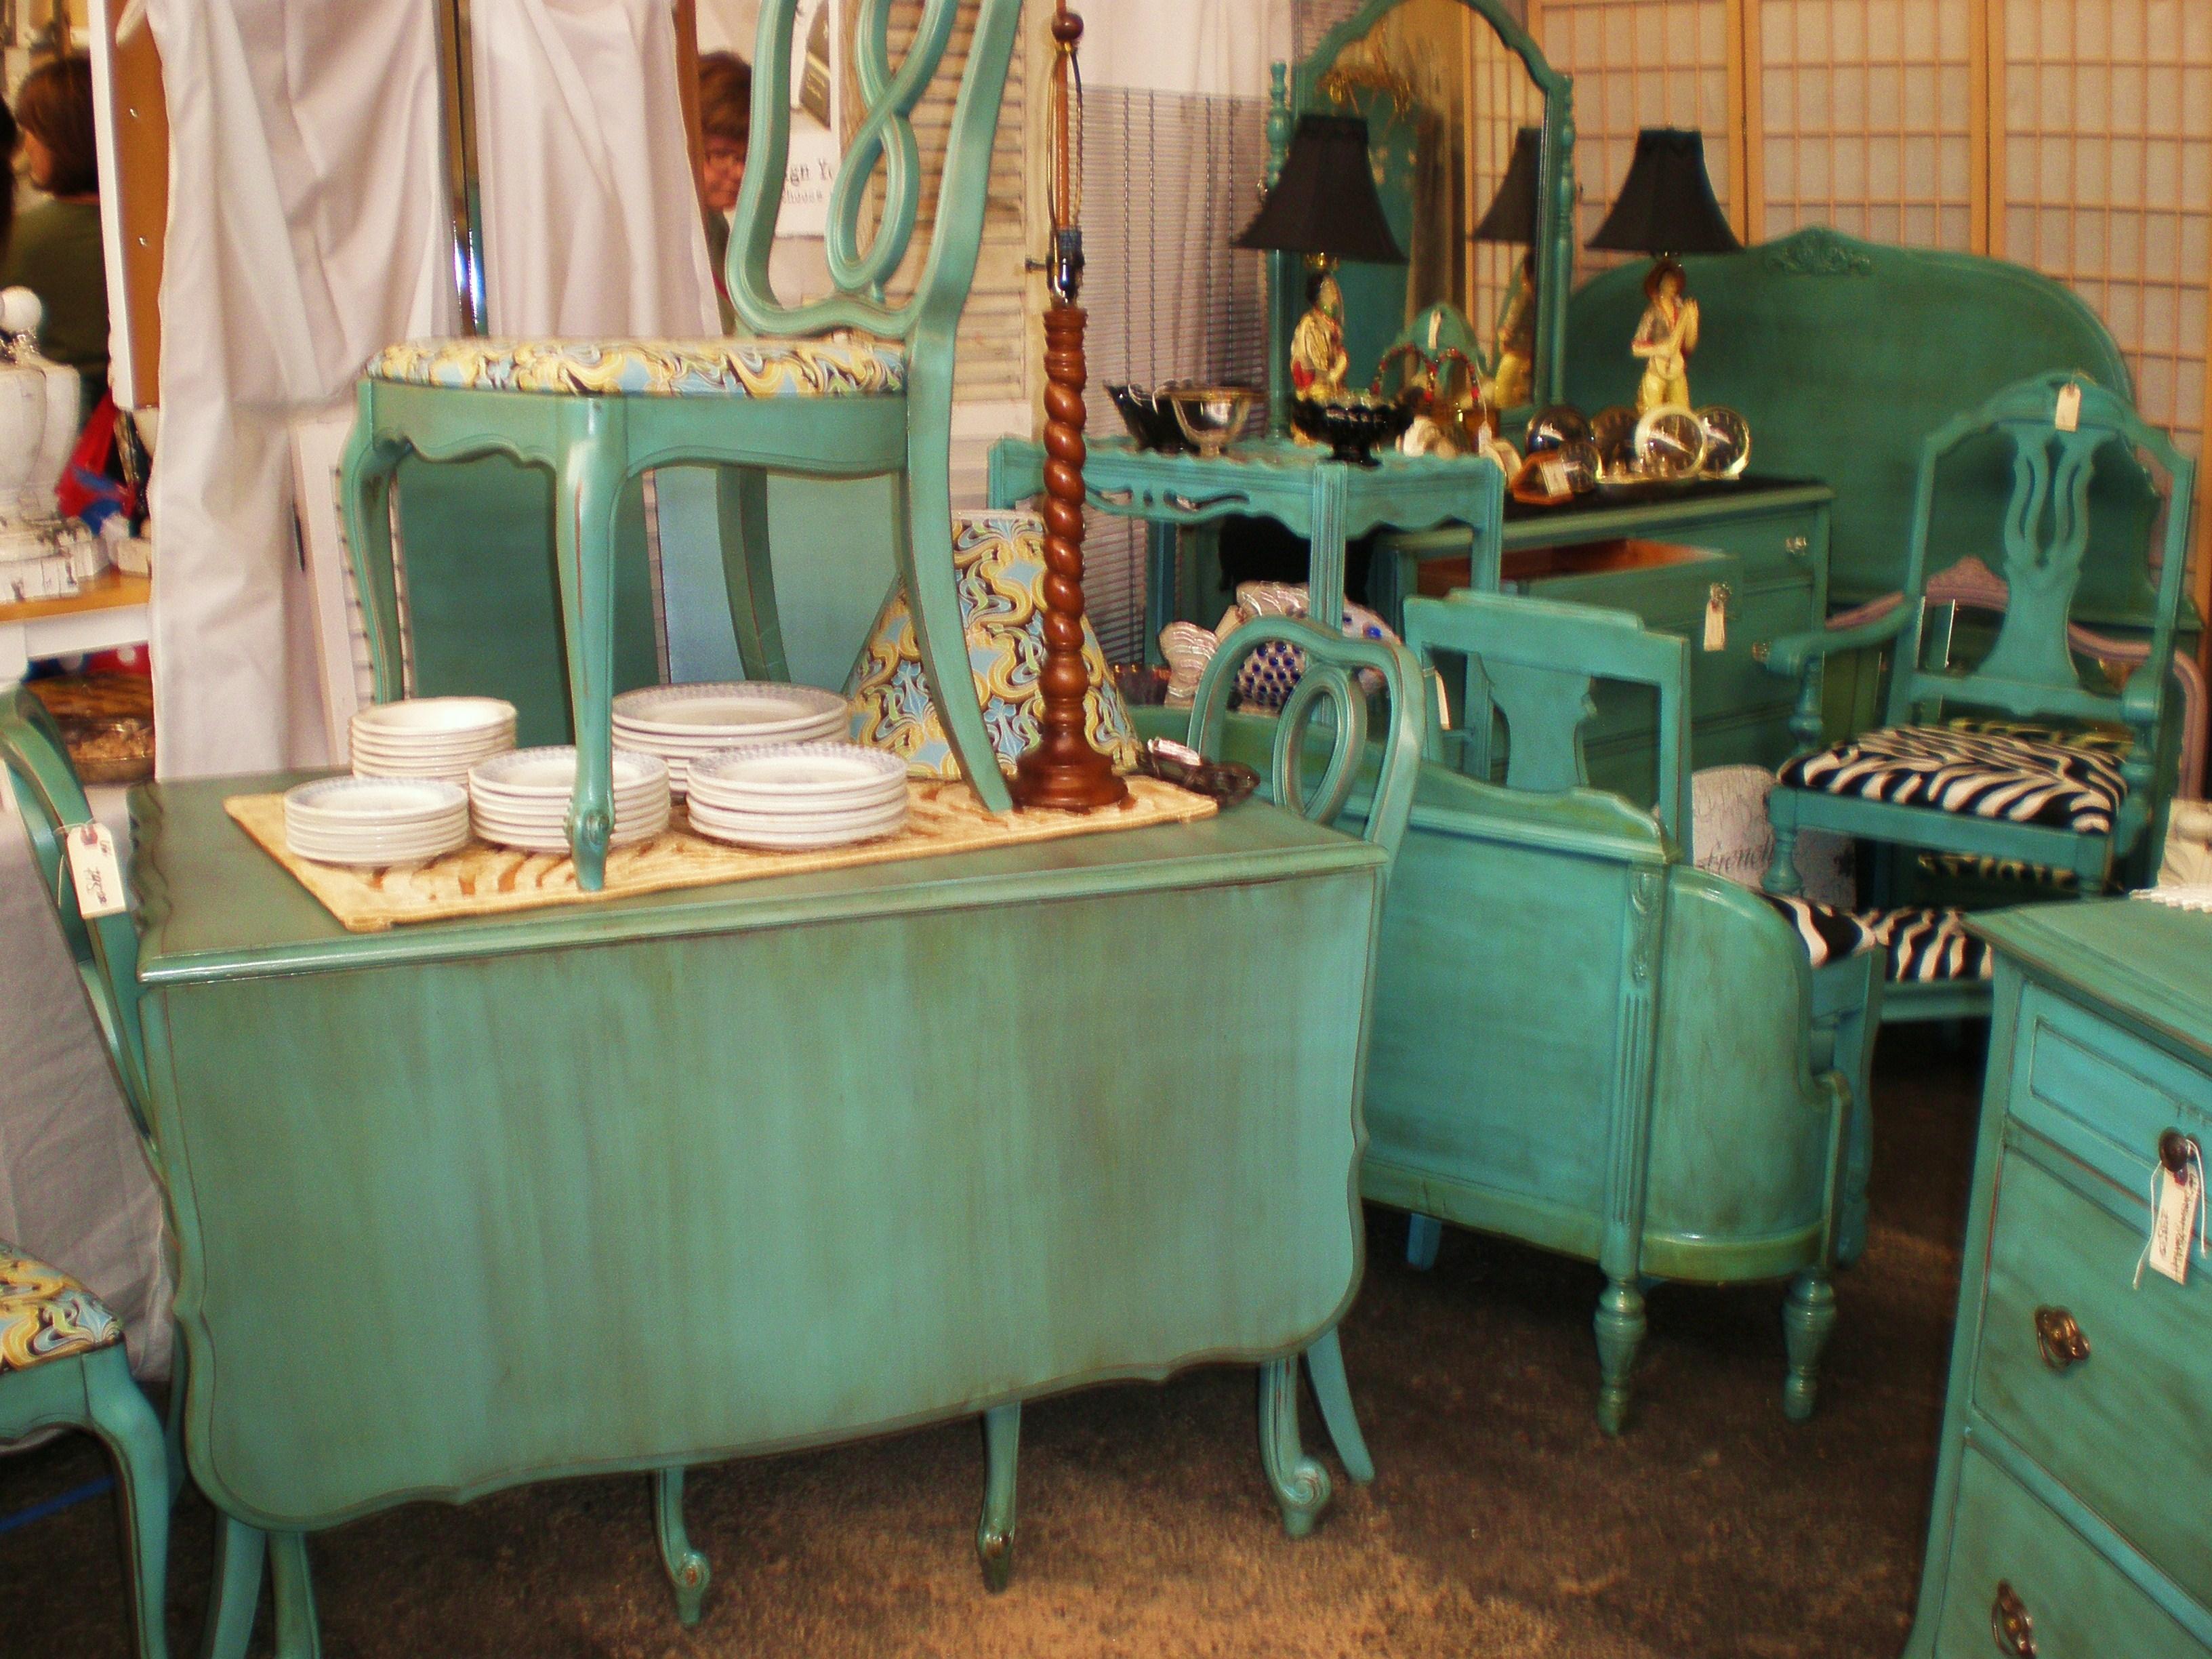 white kitchen cabinets with glaze images turquoise kitchen cabinets White Kitchen Cabinets With Glaze Images